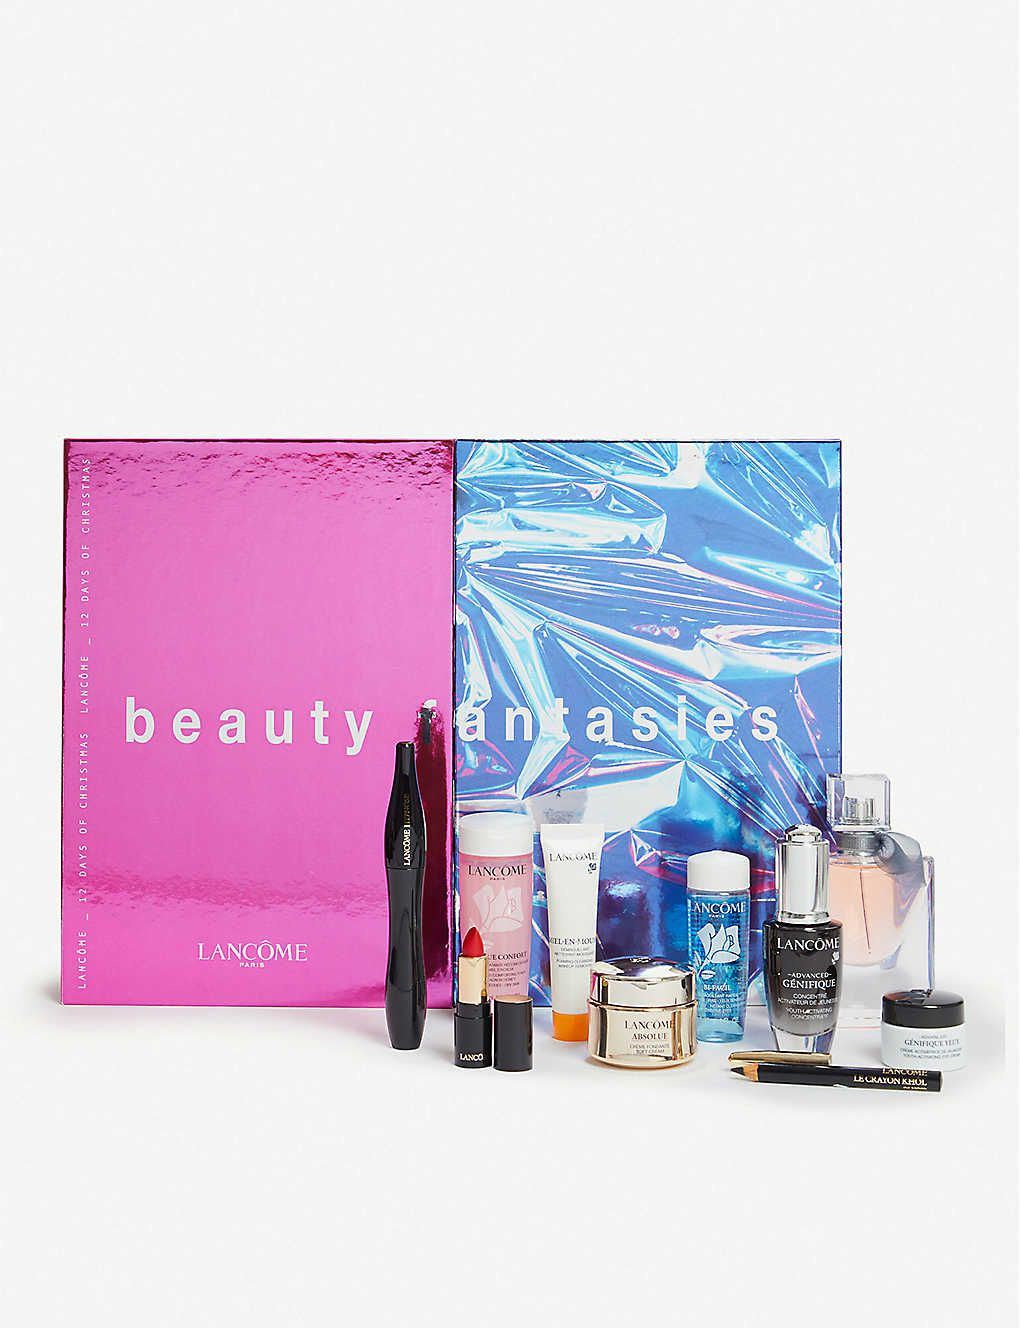 Lancome Beauty Fantasies Advent Calendar 2019 Beauty Advent Calendar Lancome Calendar